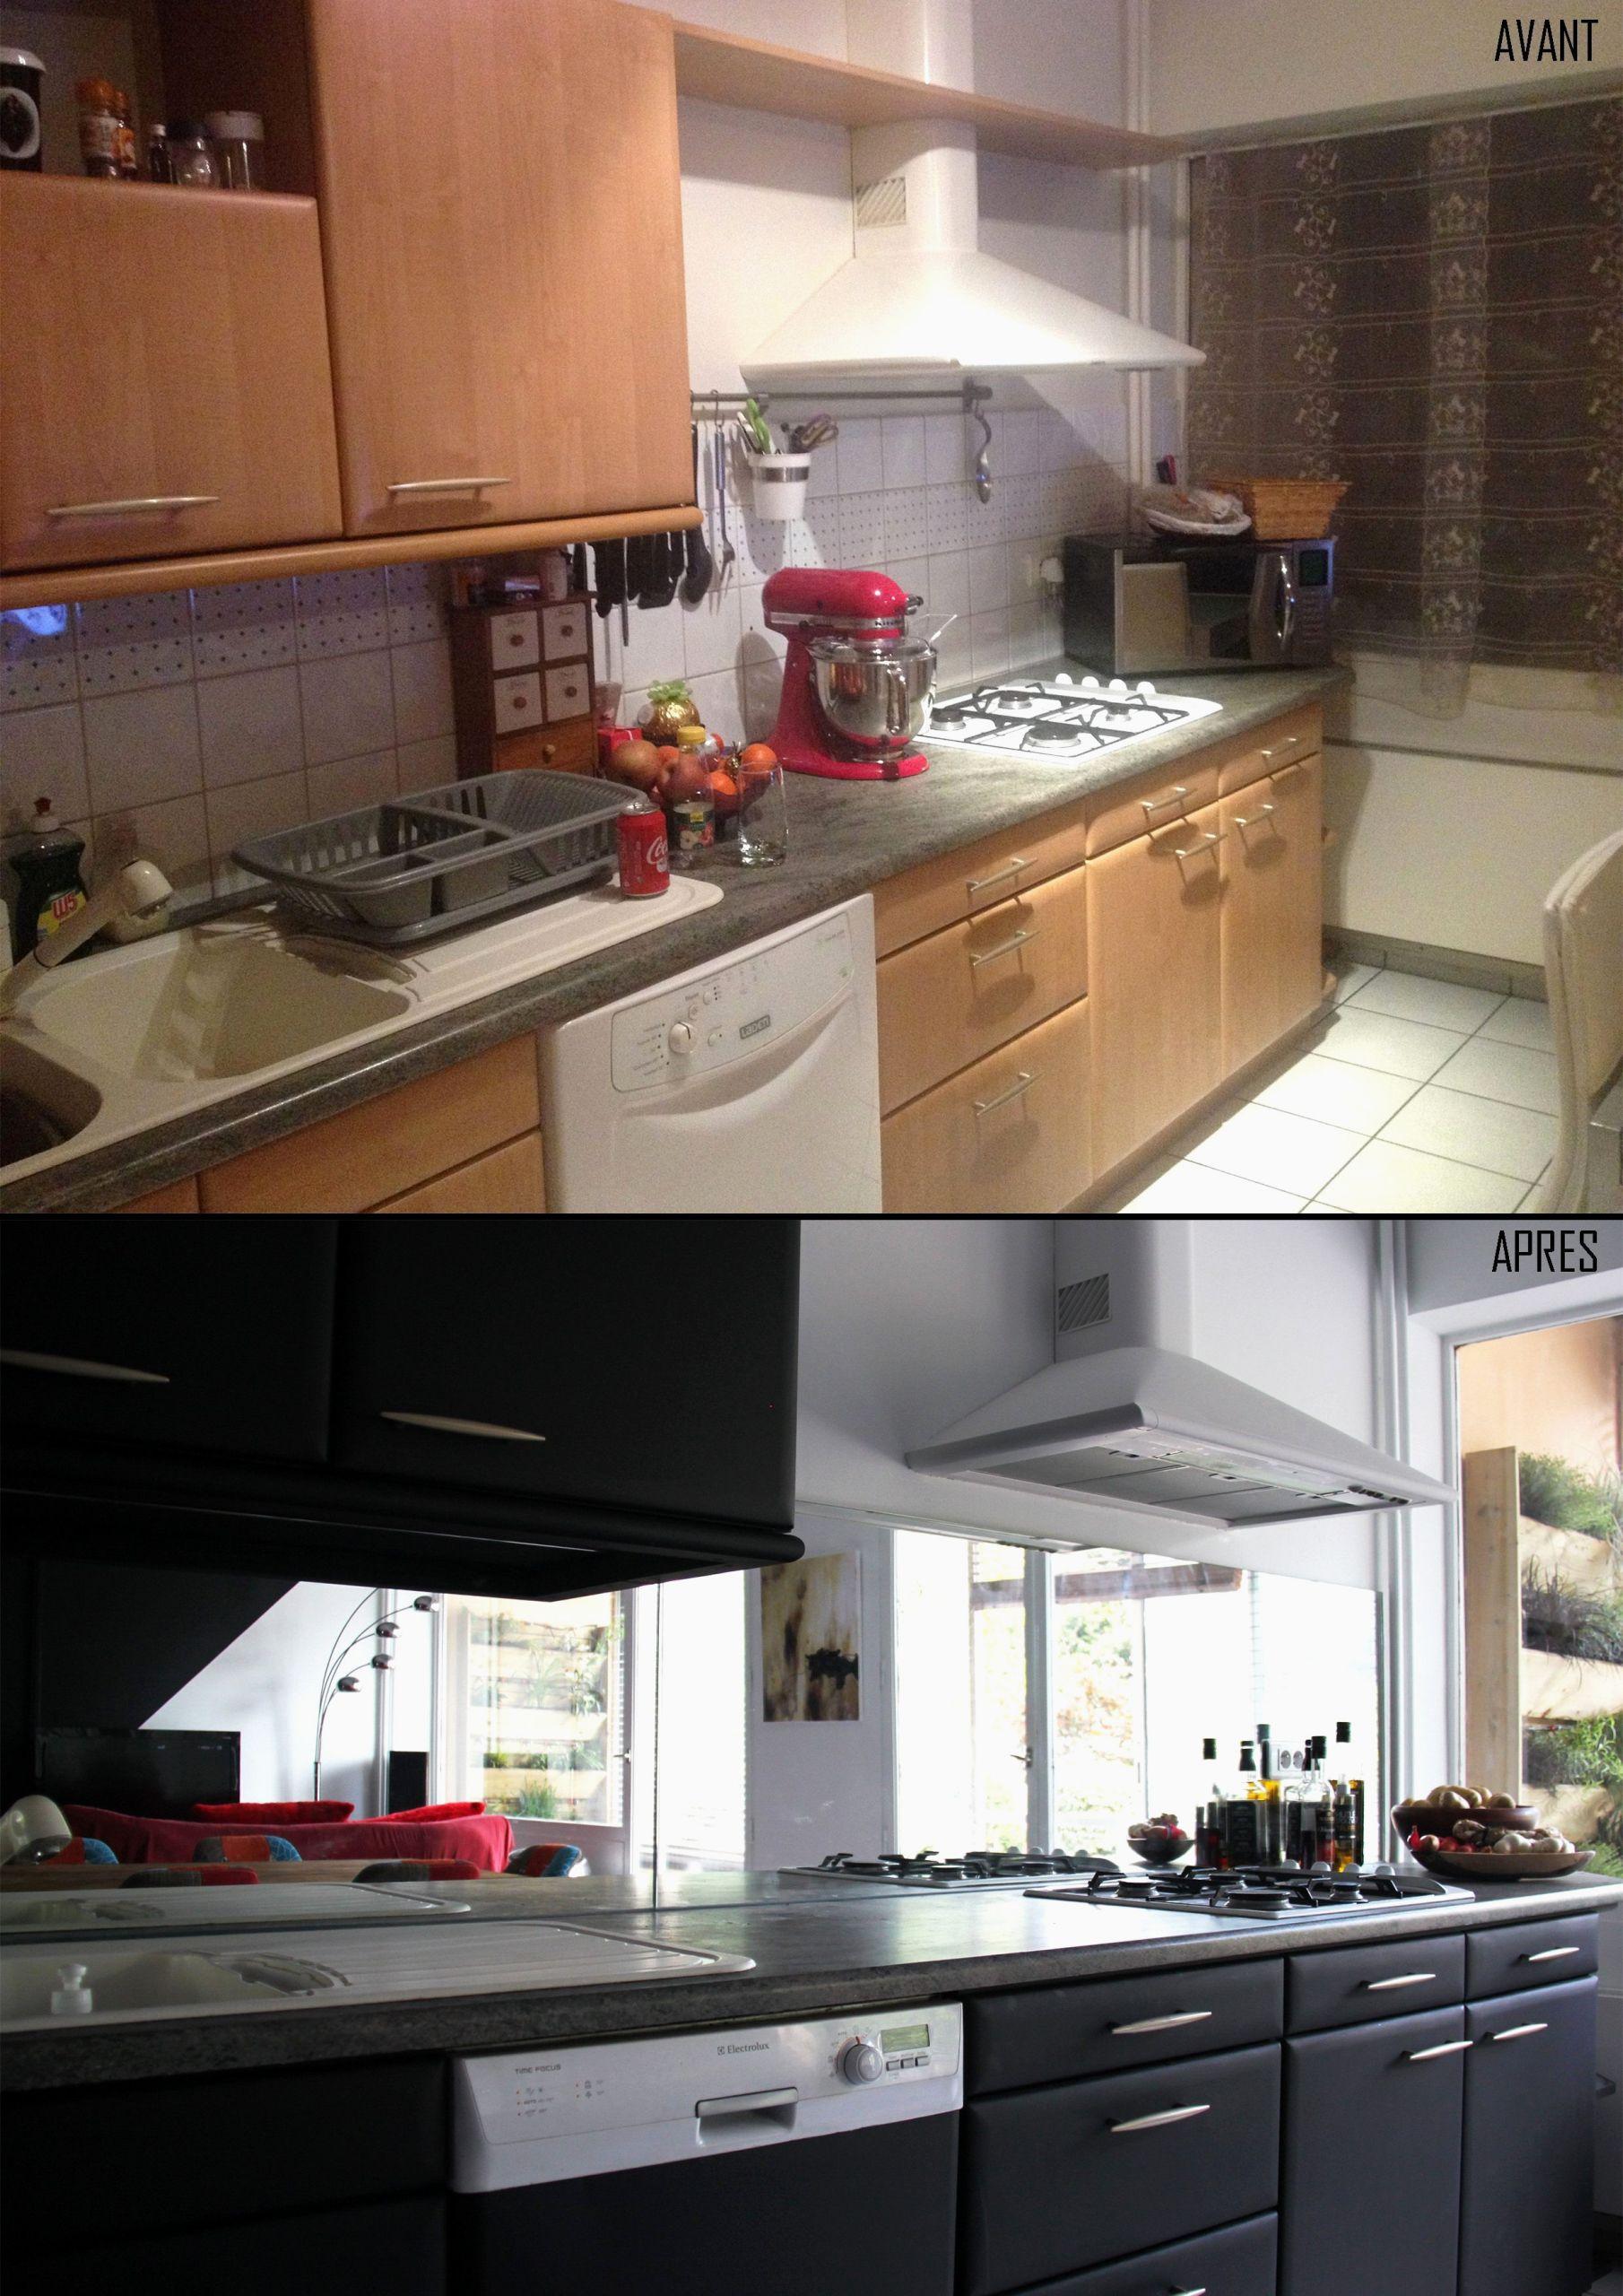 magasin de cuisine impressionnant 96 idees de design meuble but cuisine de magasin de cuisine